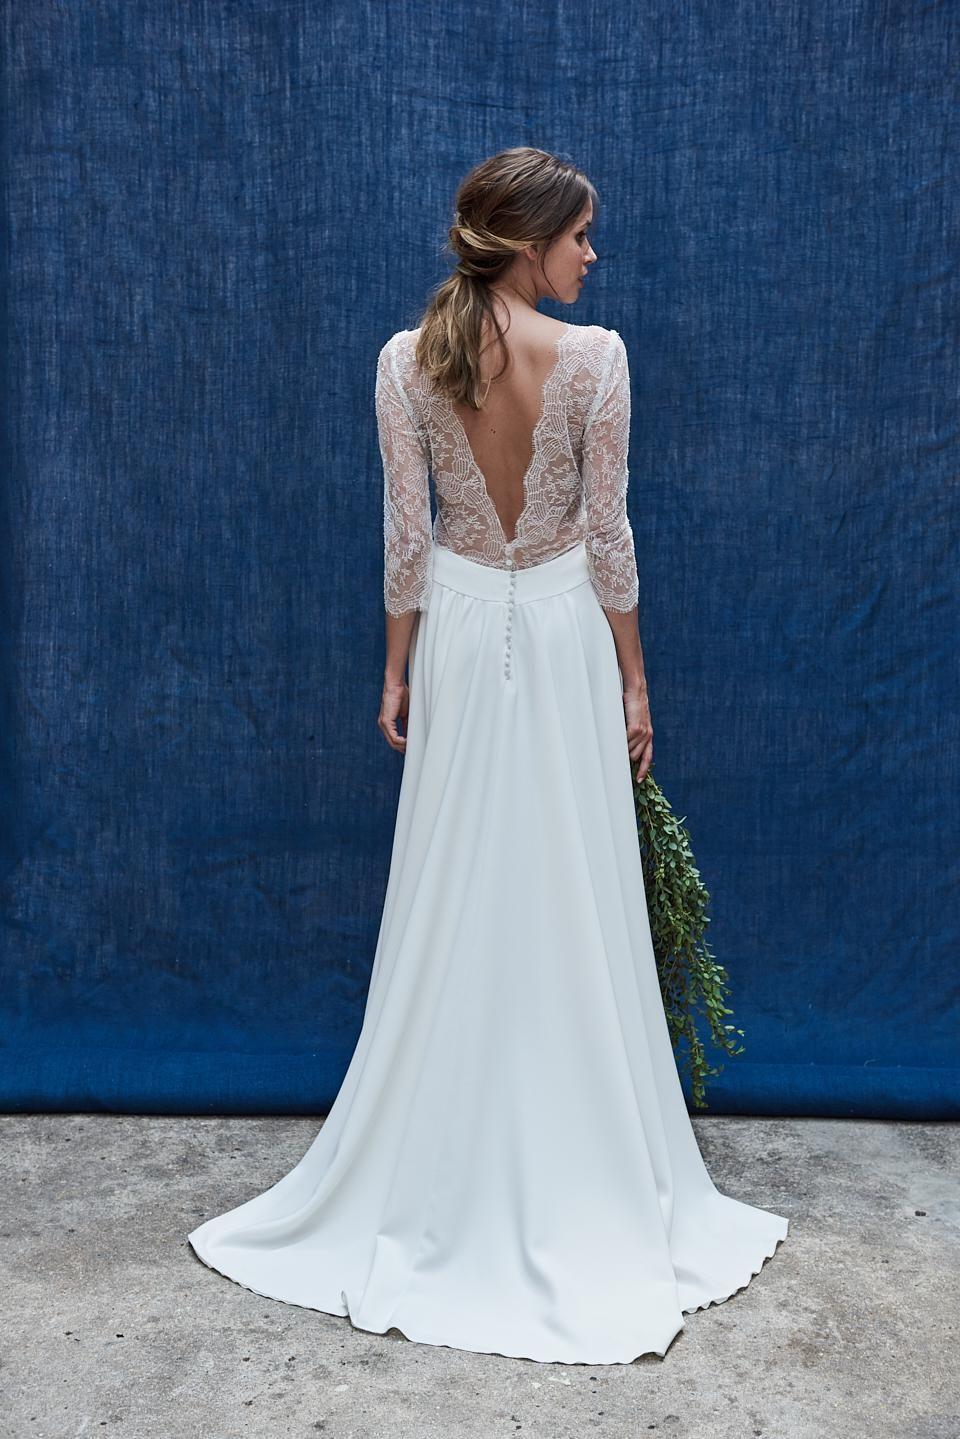 Quelle robe de mariée pour dire oui en 2018 ? | Vestidos novia, Boda ...